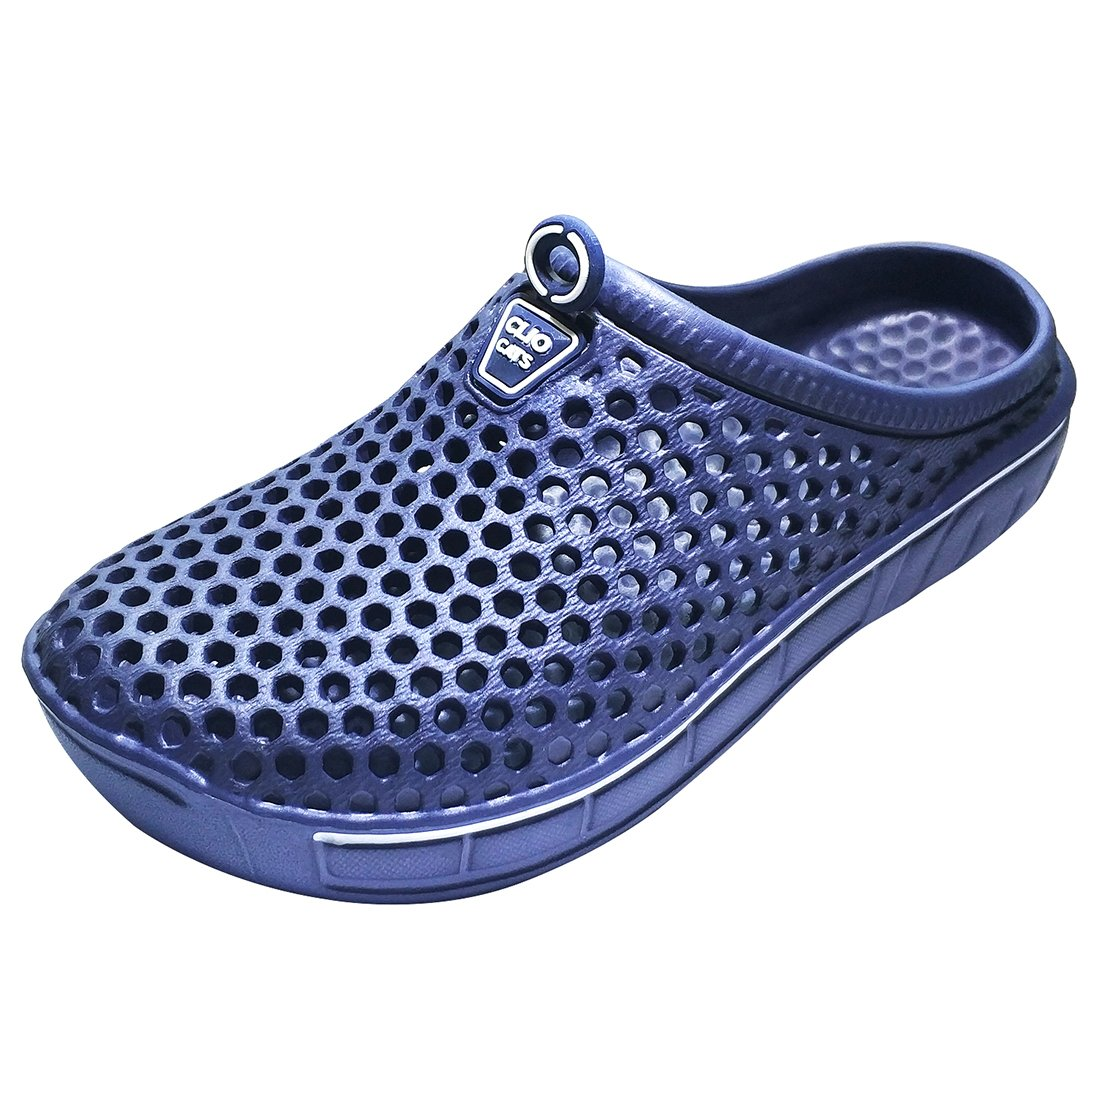 IVAO Unisex Garden Clog Shoes Sandal Quick Drying Navy 8 B(M) US Women/7 D(M) US Men